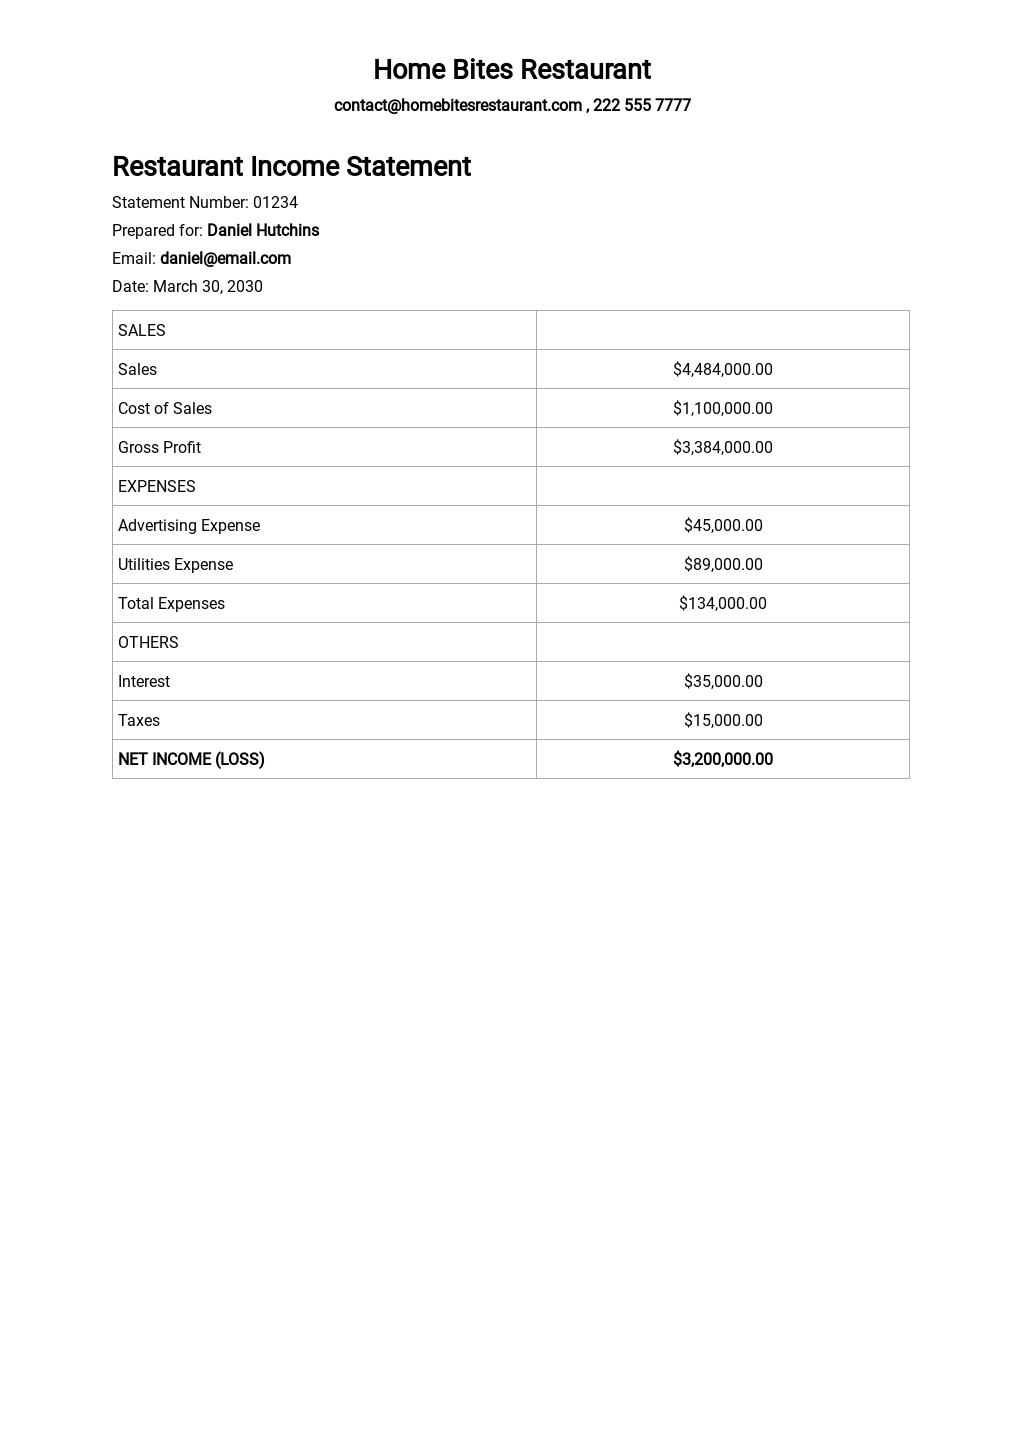 Restaurant Income Statement Quarterly Template